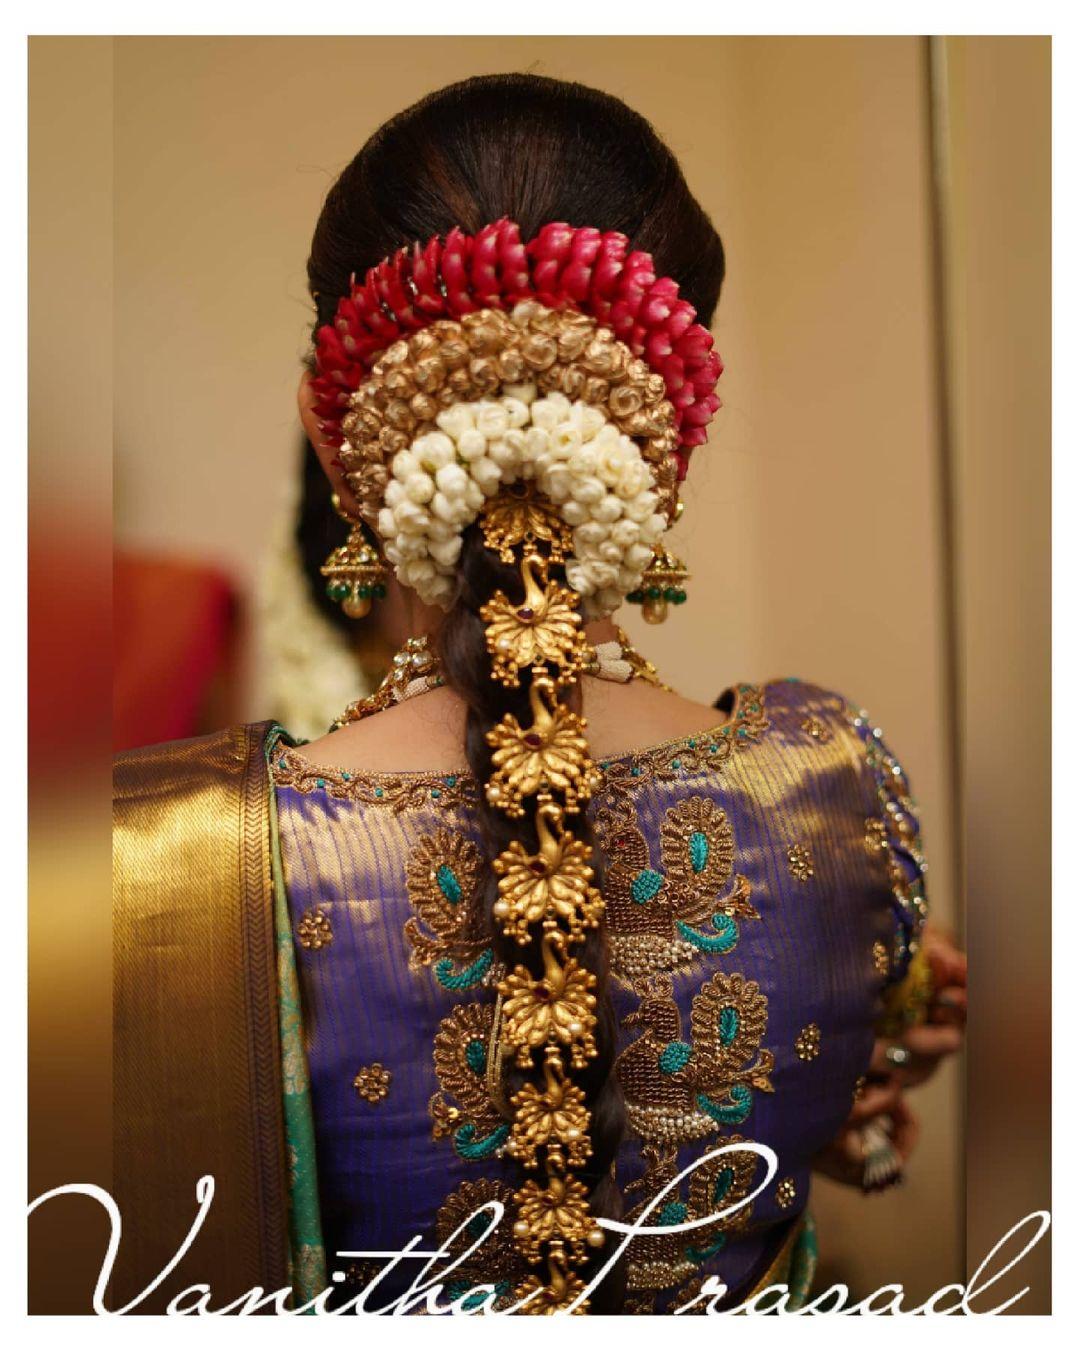 Stunning purple brocade blouse with swan design hand embroidery  aari work on back. 2021-05-15